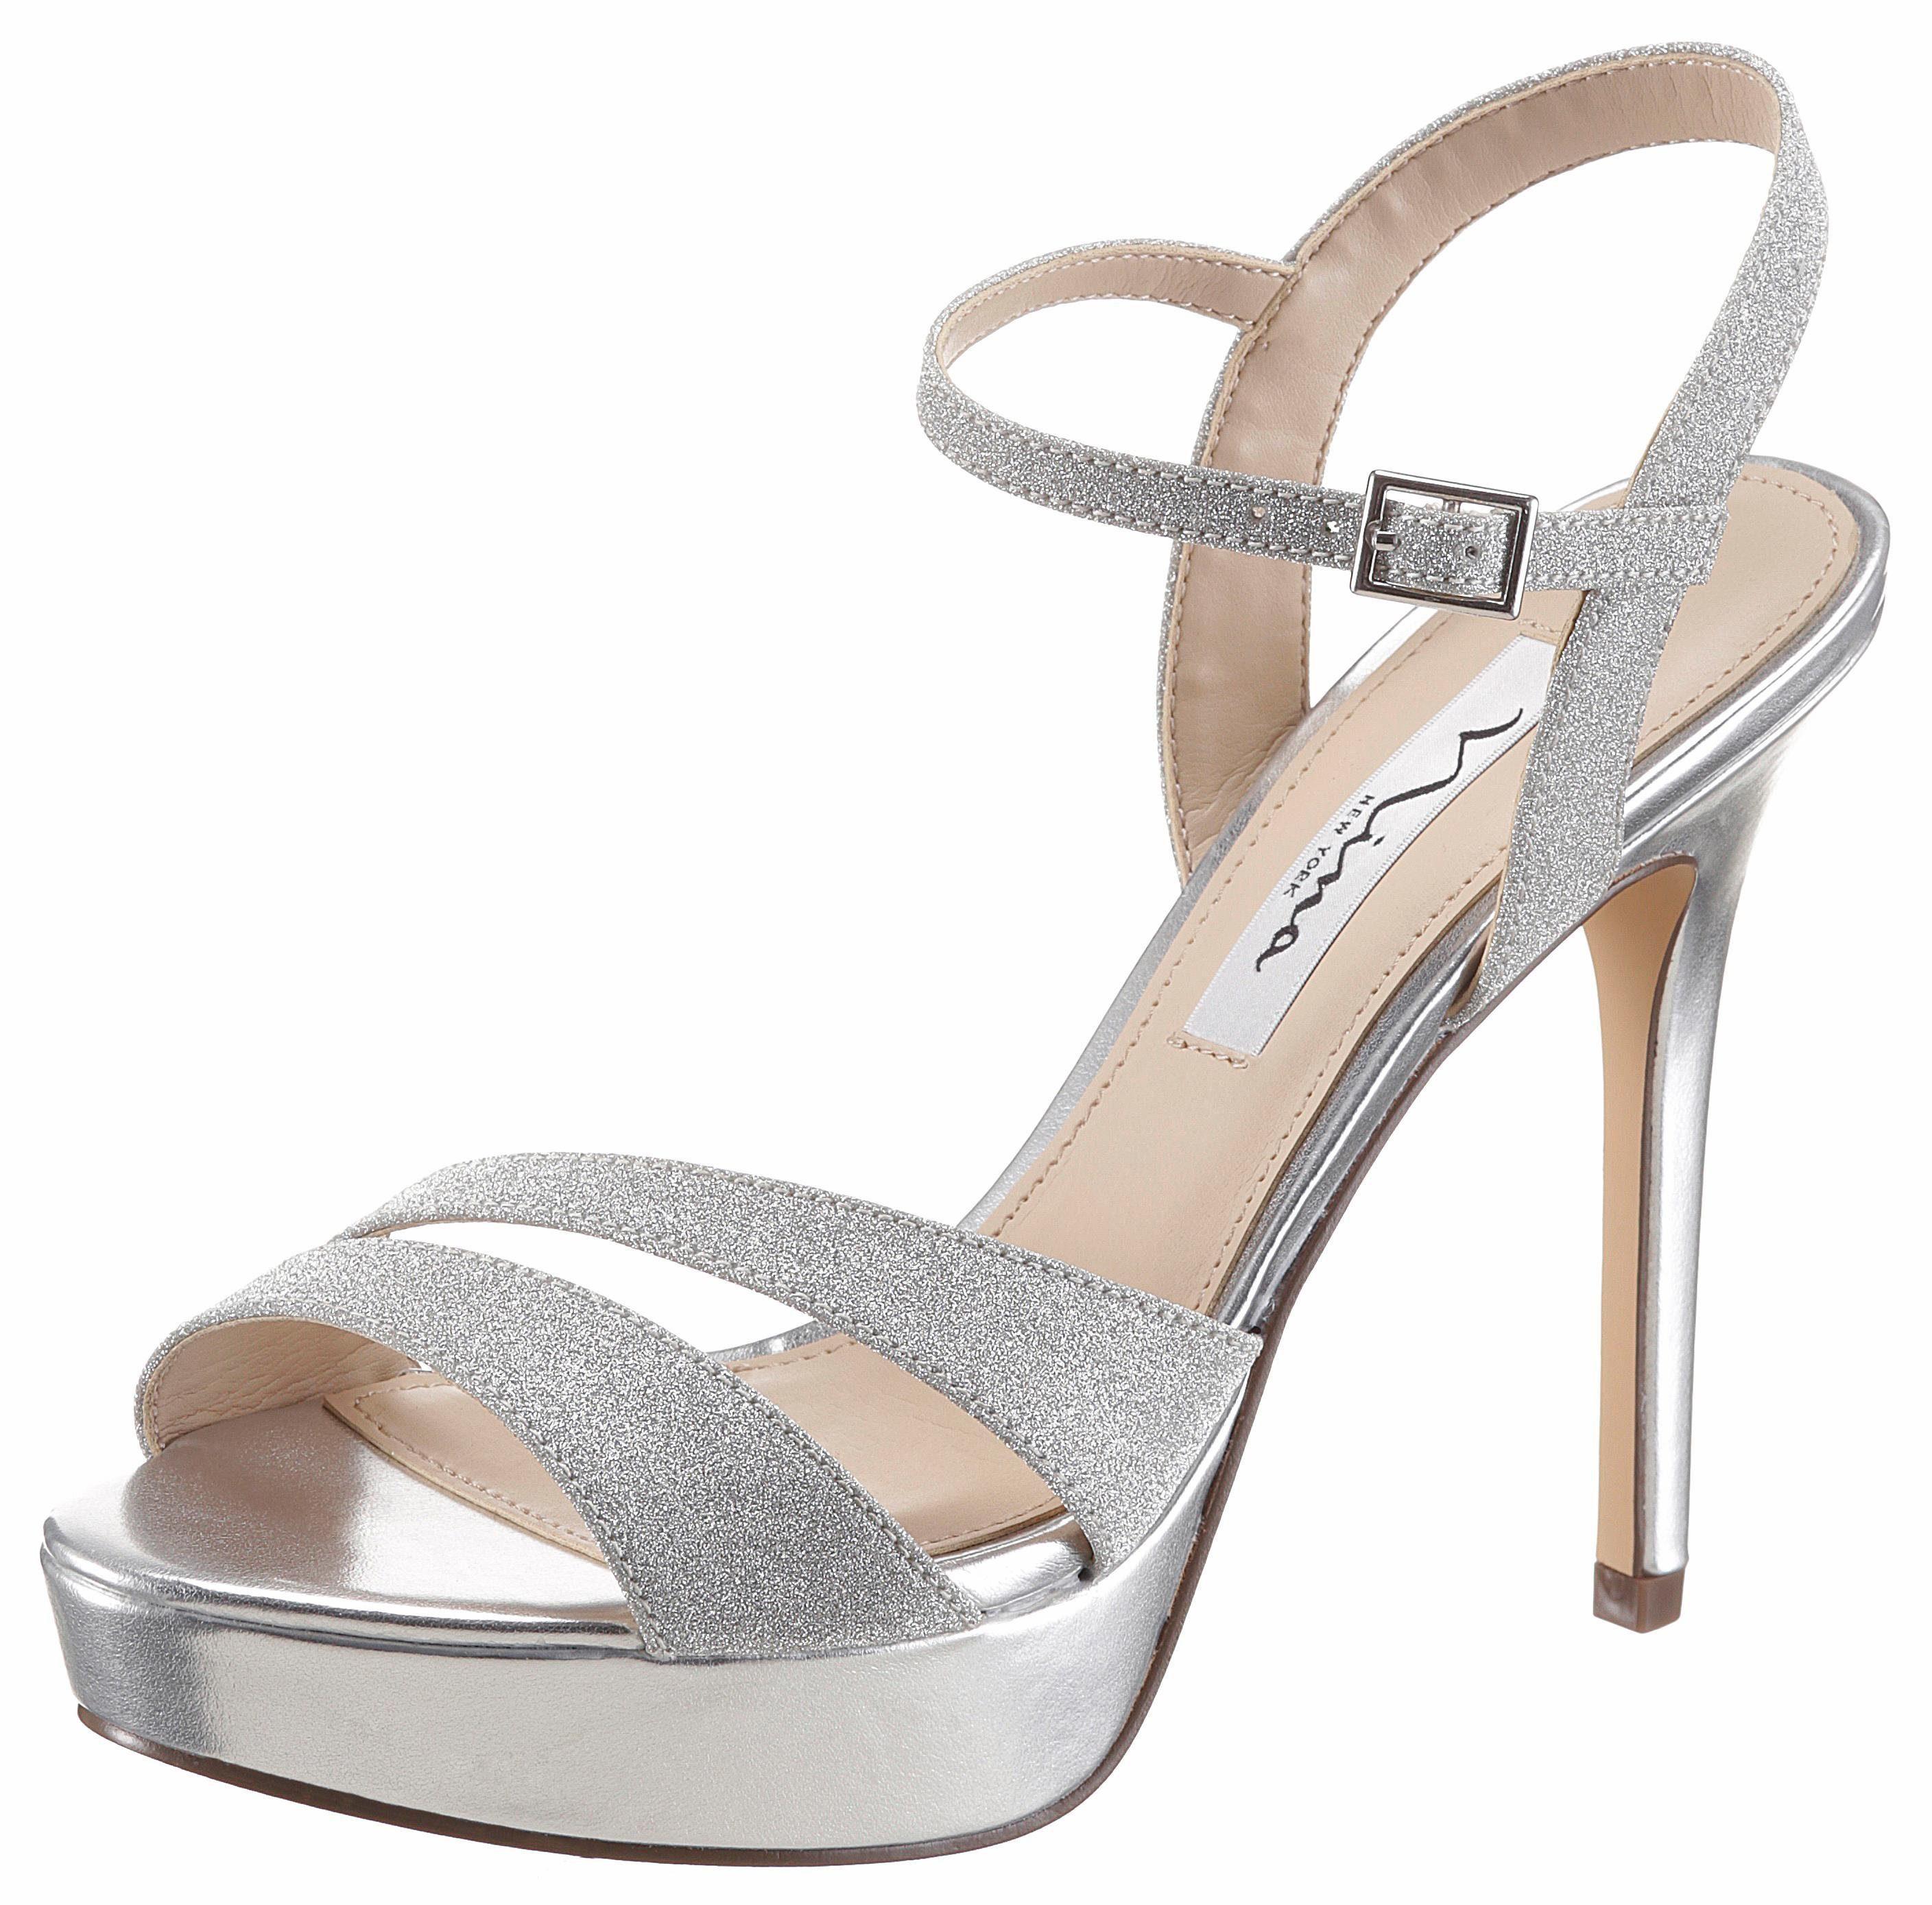 Nina »Solina« High-Heel-Sandalette, im femininen Design, silberfarben, silberfarben